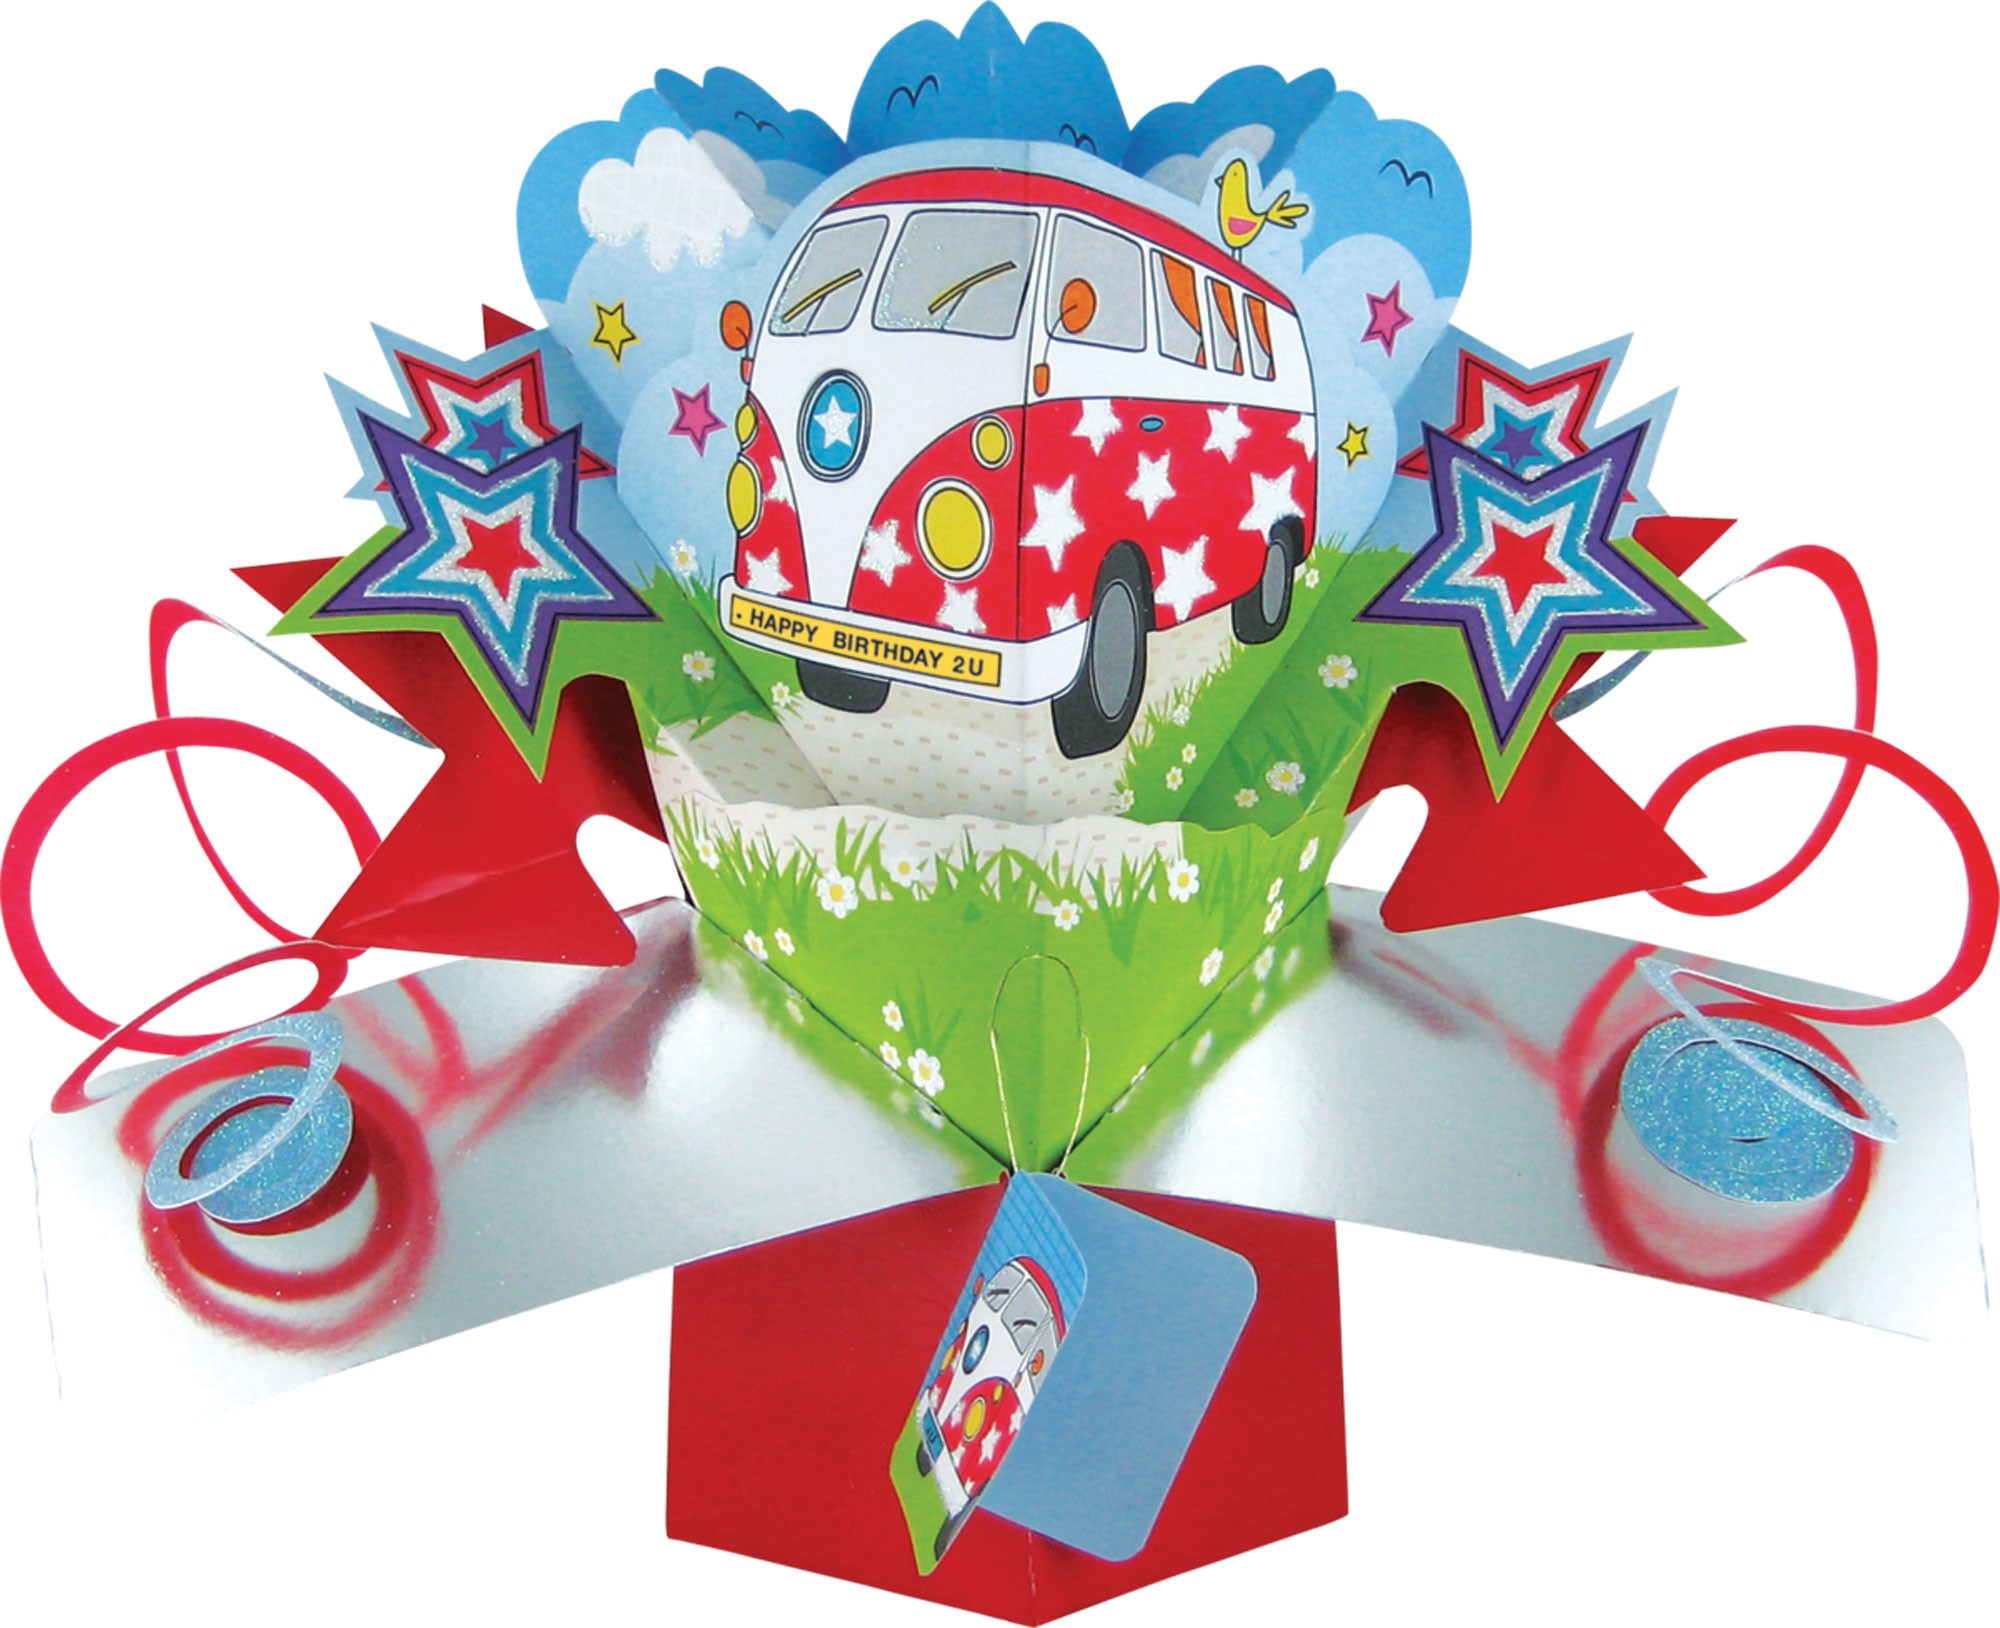 Happy Birthday 3D Pop Up Card